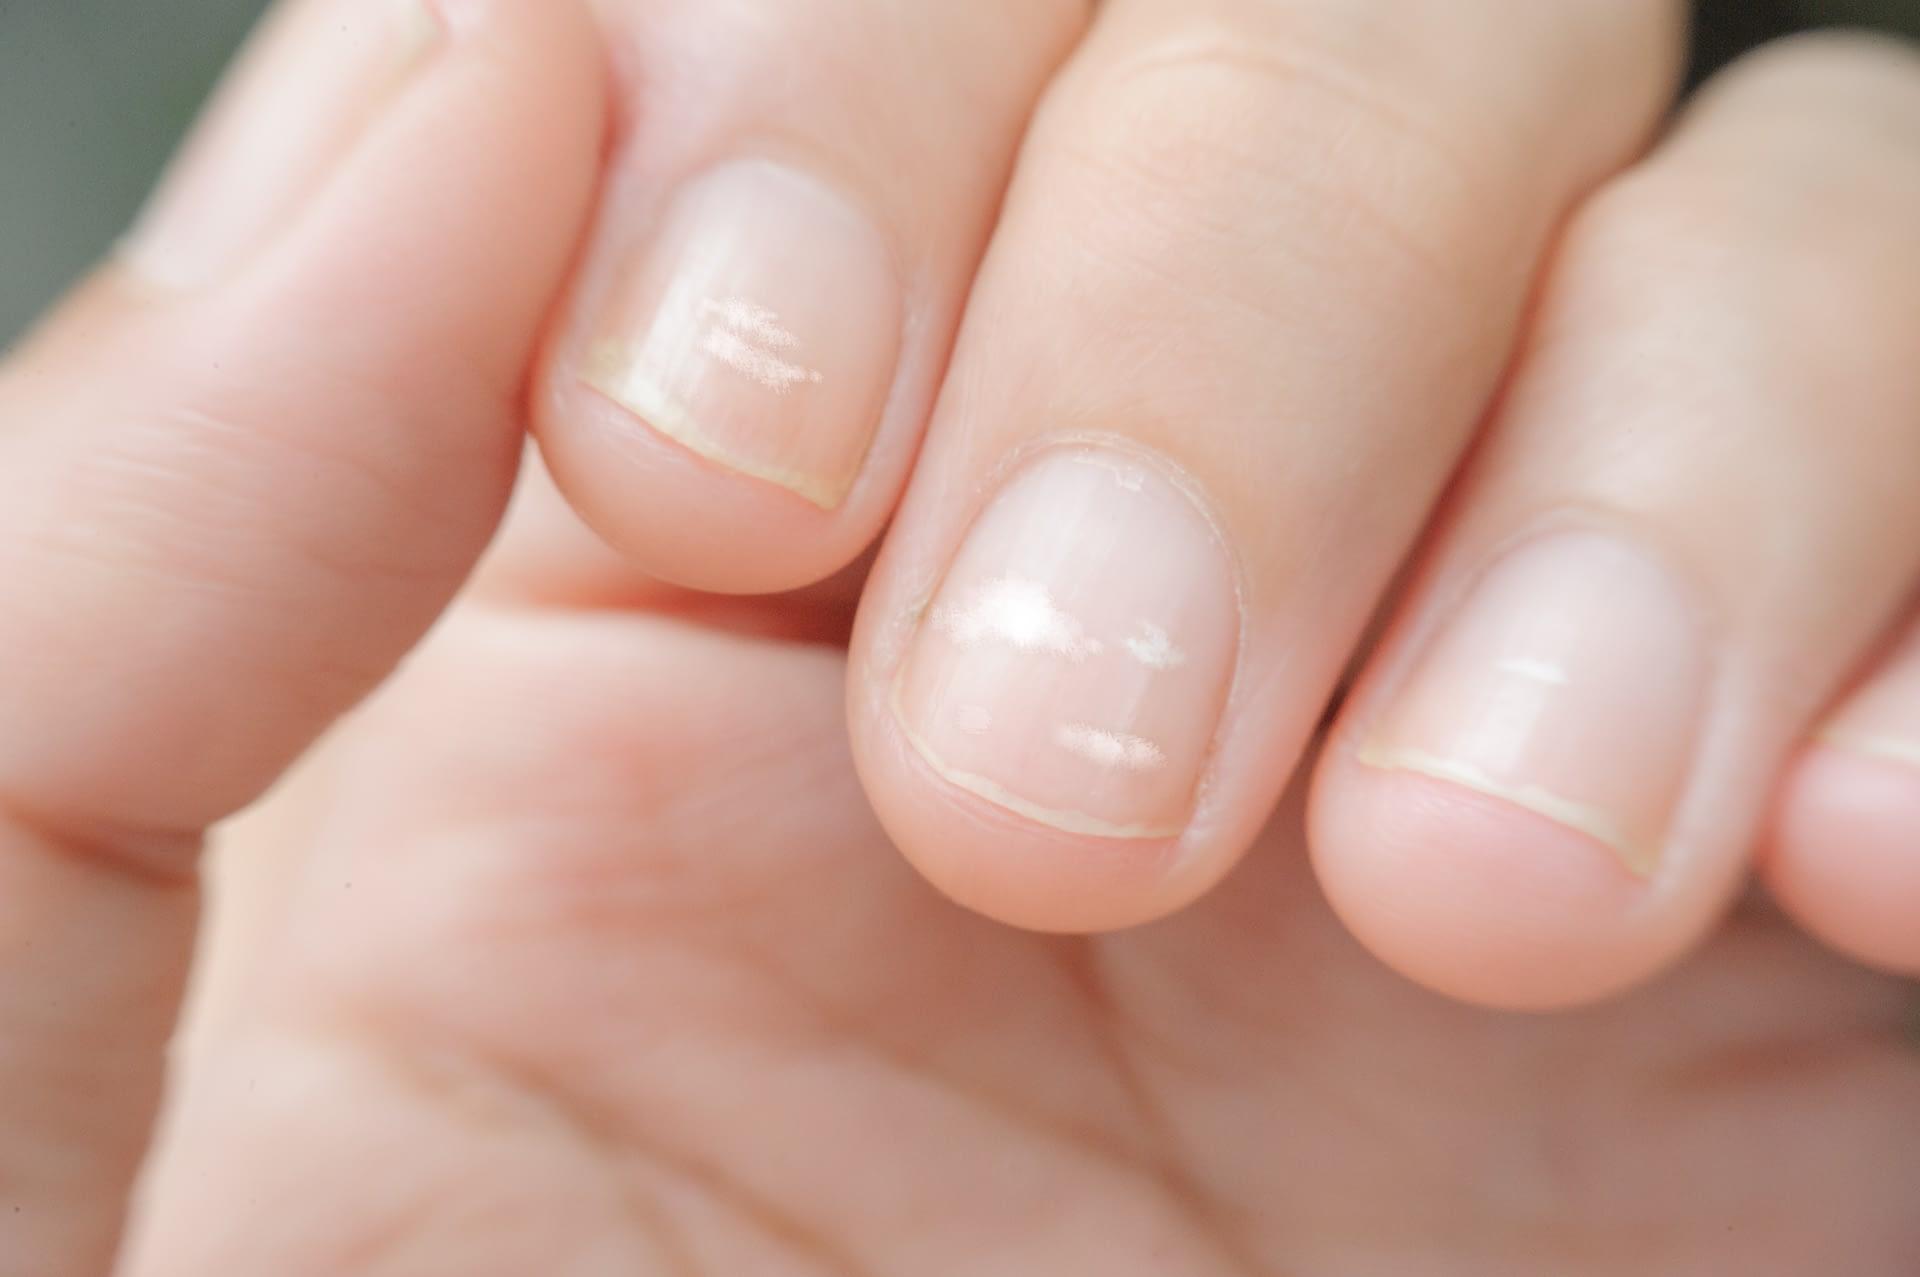 A closeup of visible white spots on fingernails